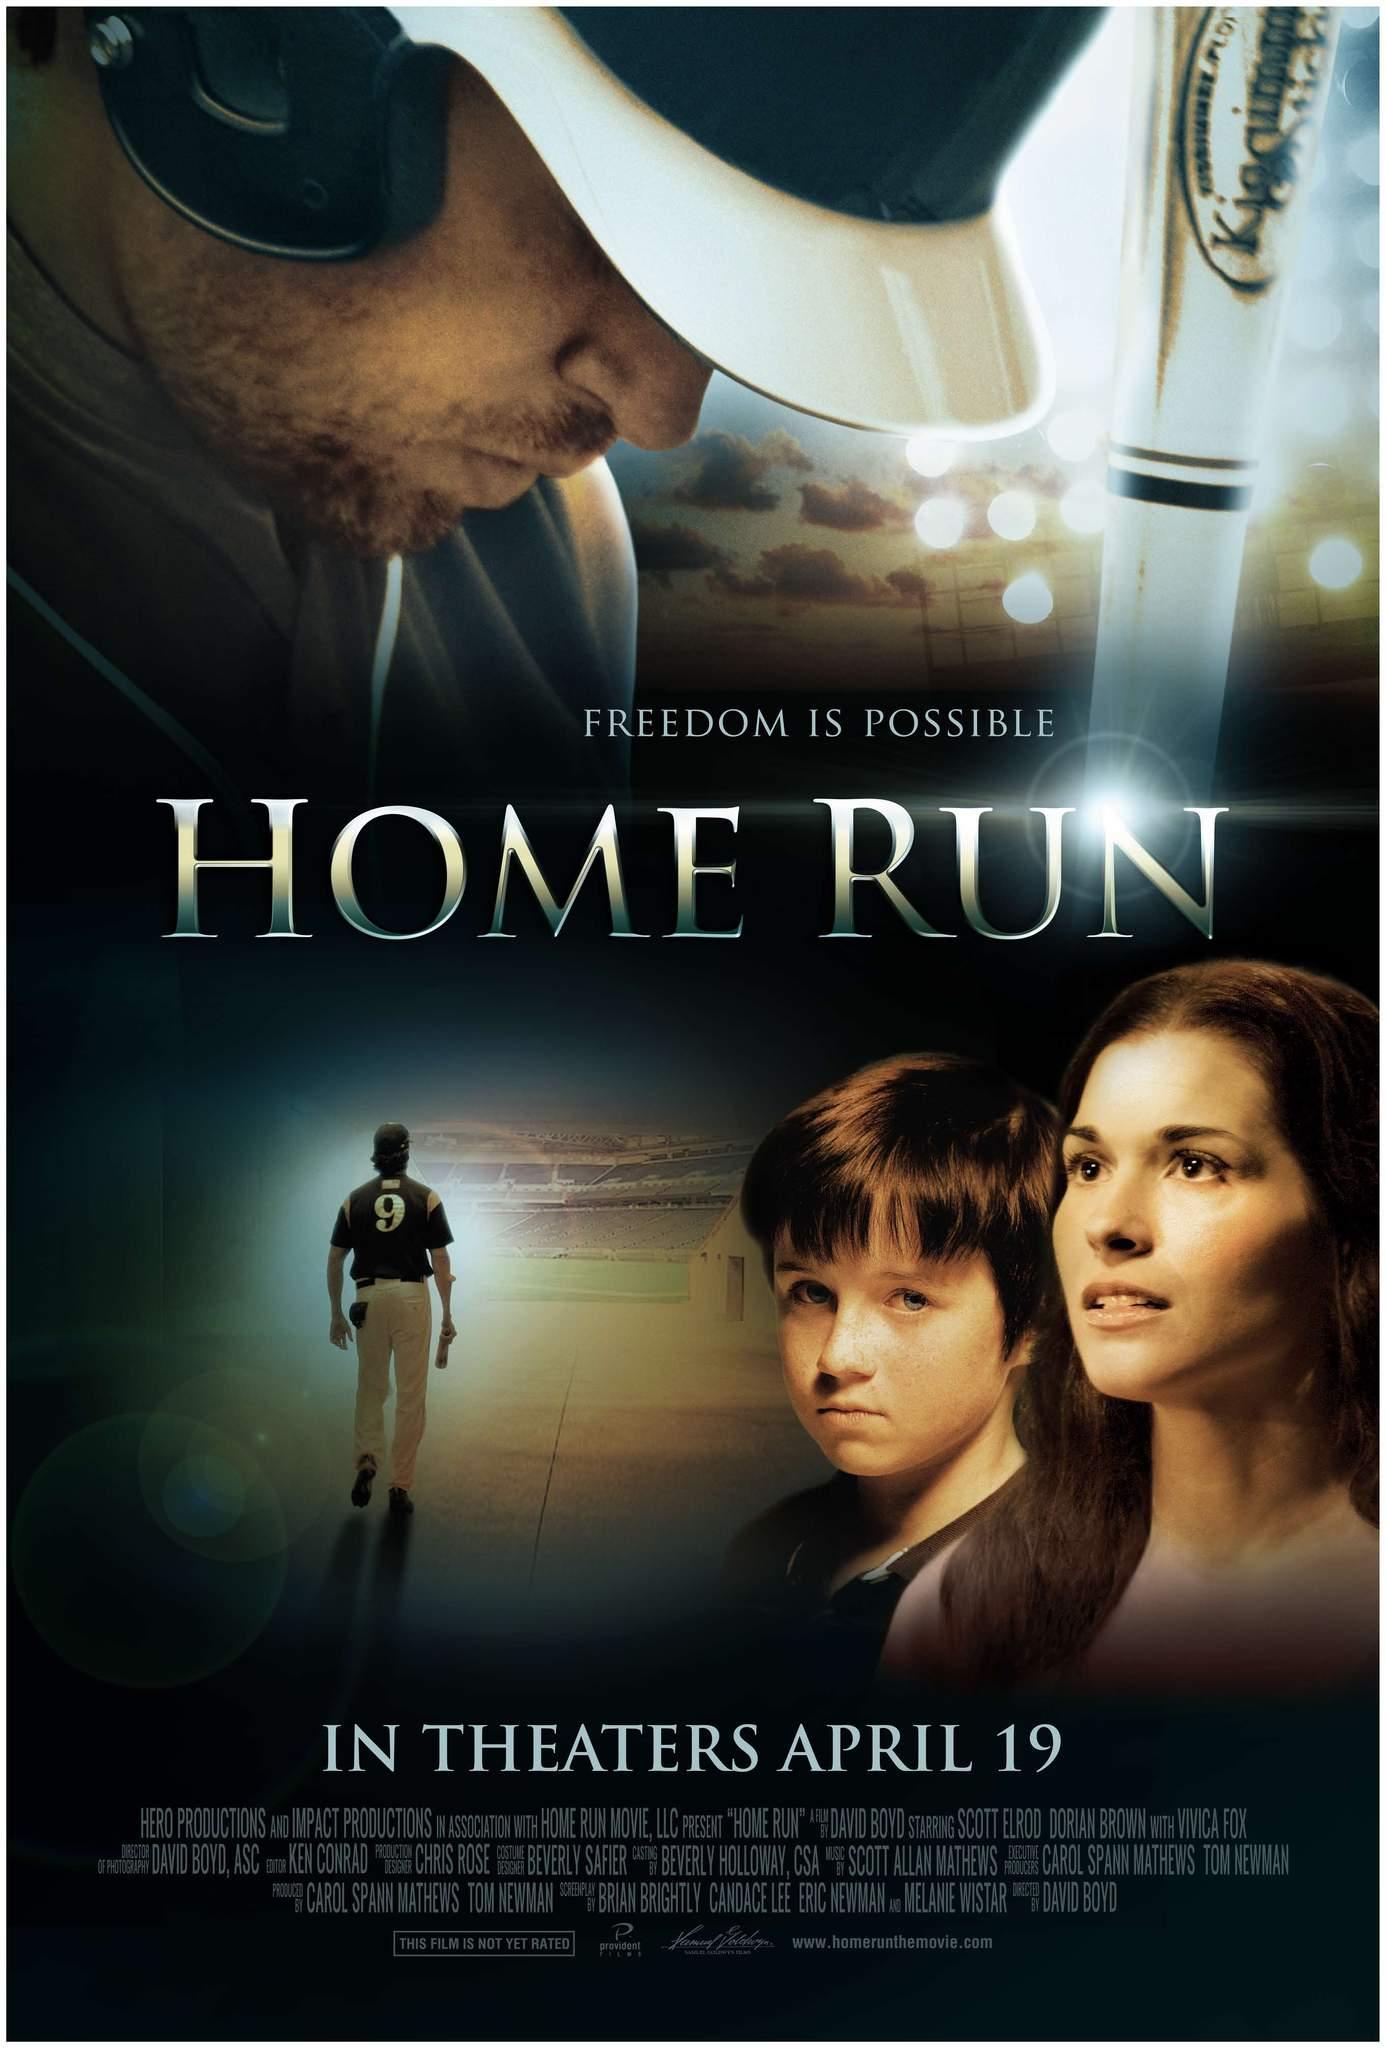 149444593c7e5 Home Run (2013) - IMDb